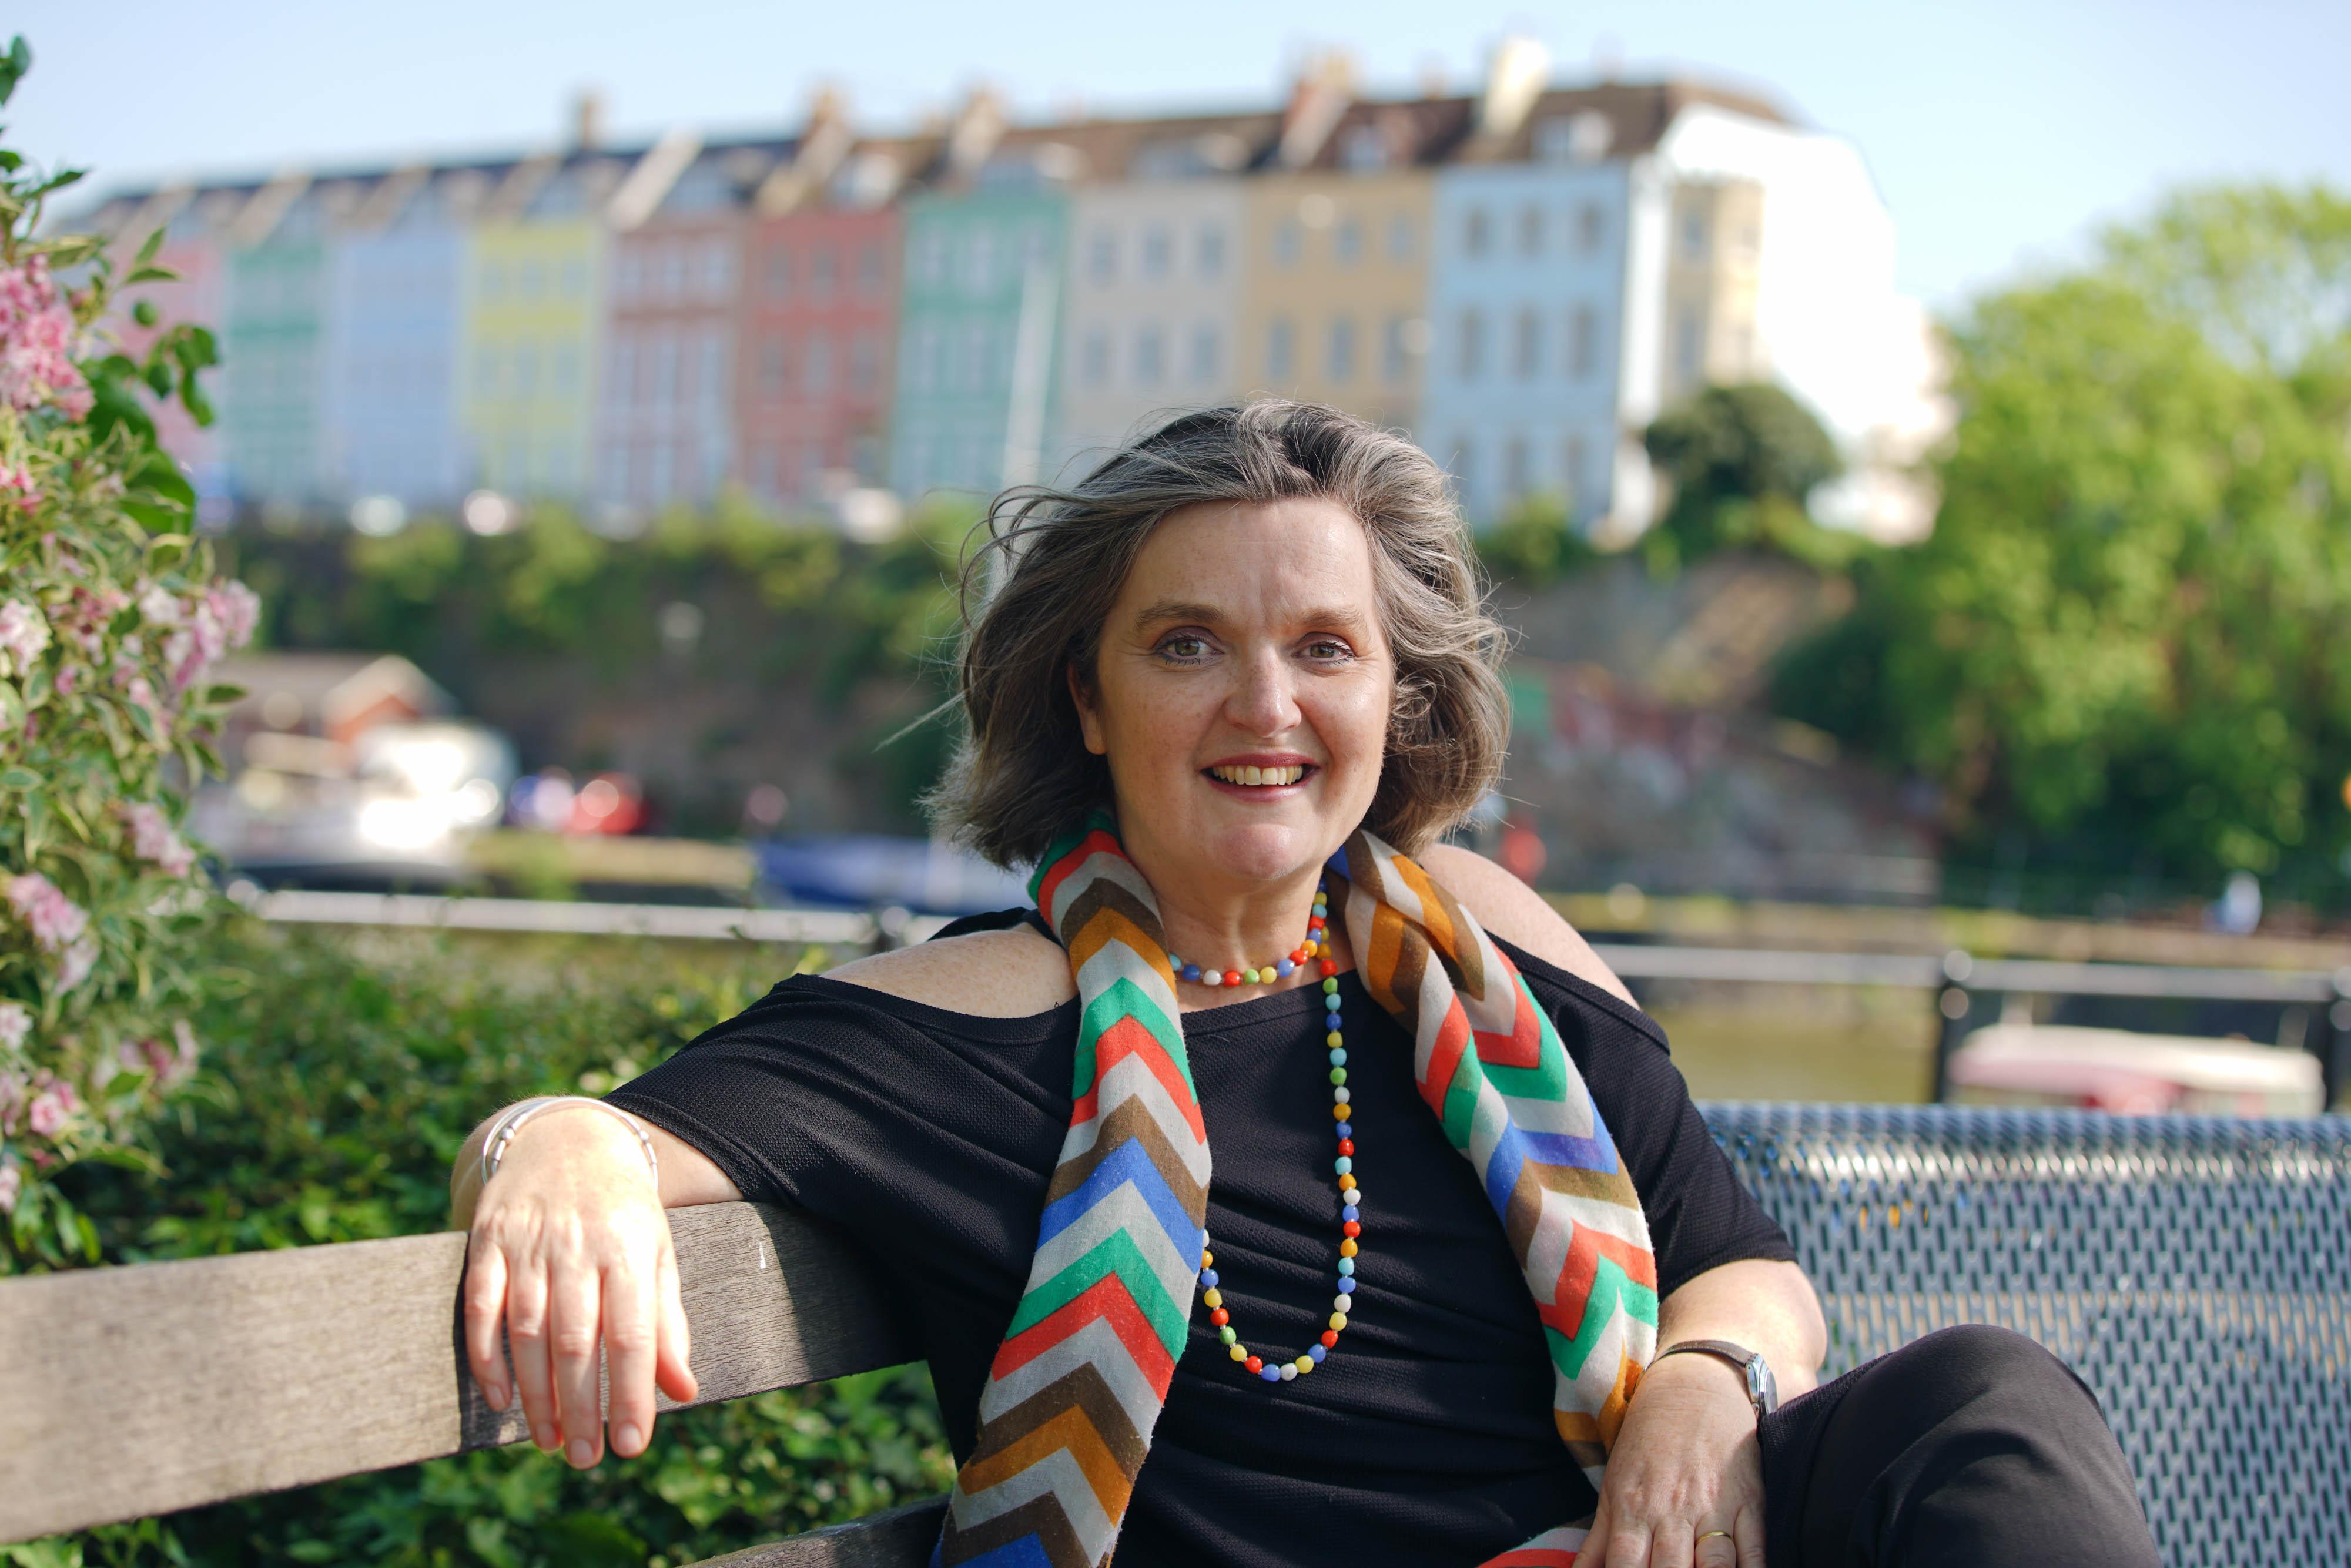 Liz Zeilder, Chief Executive, Happy City